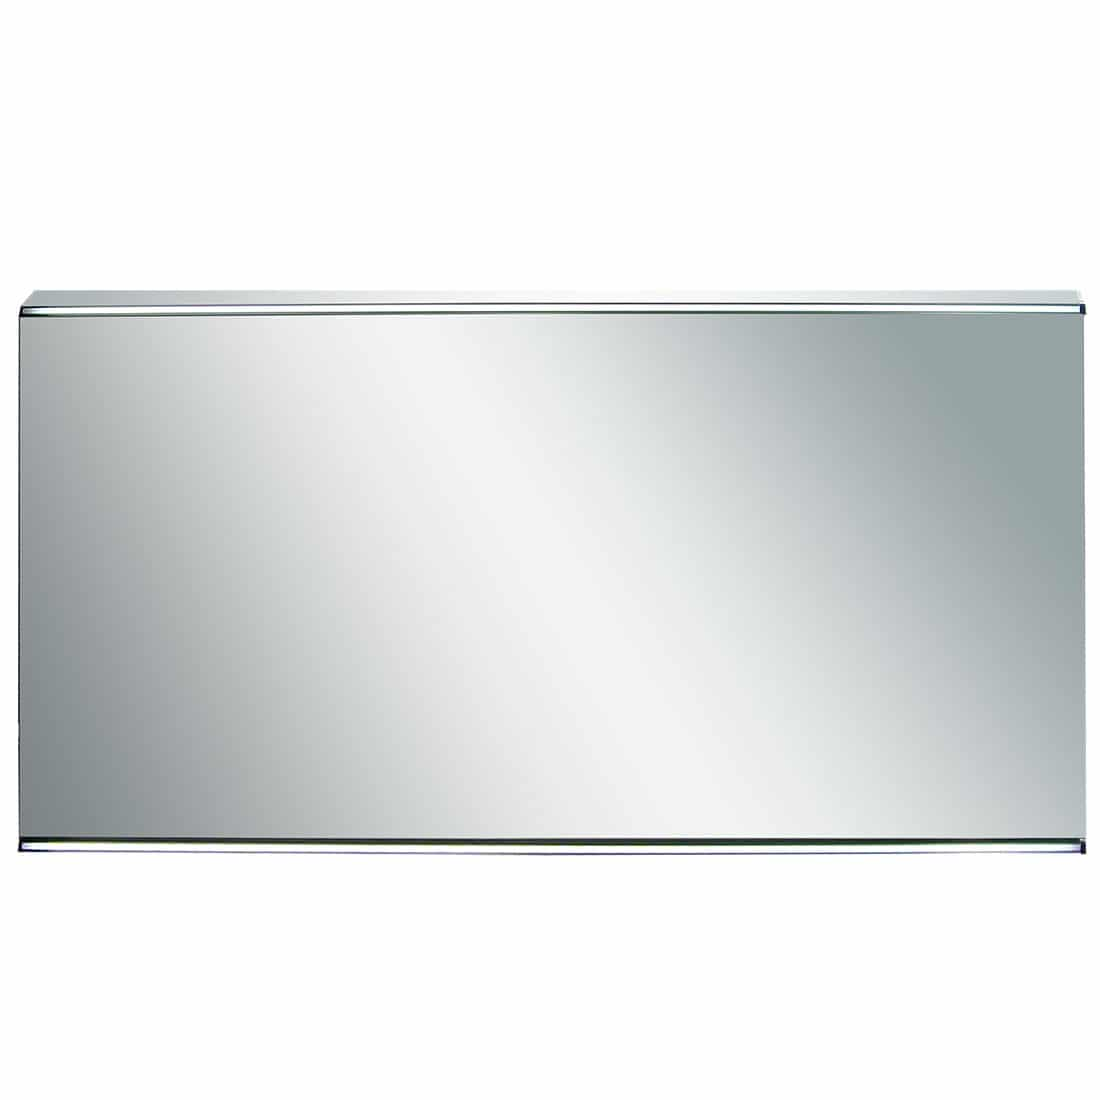 Dreamlike LED spegel